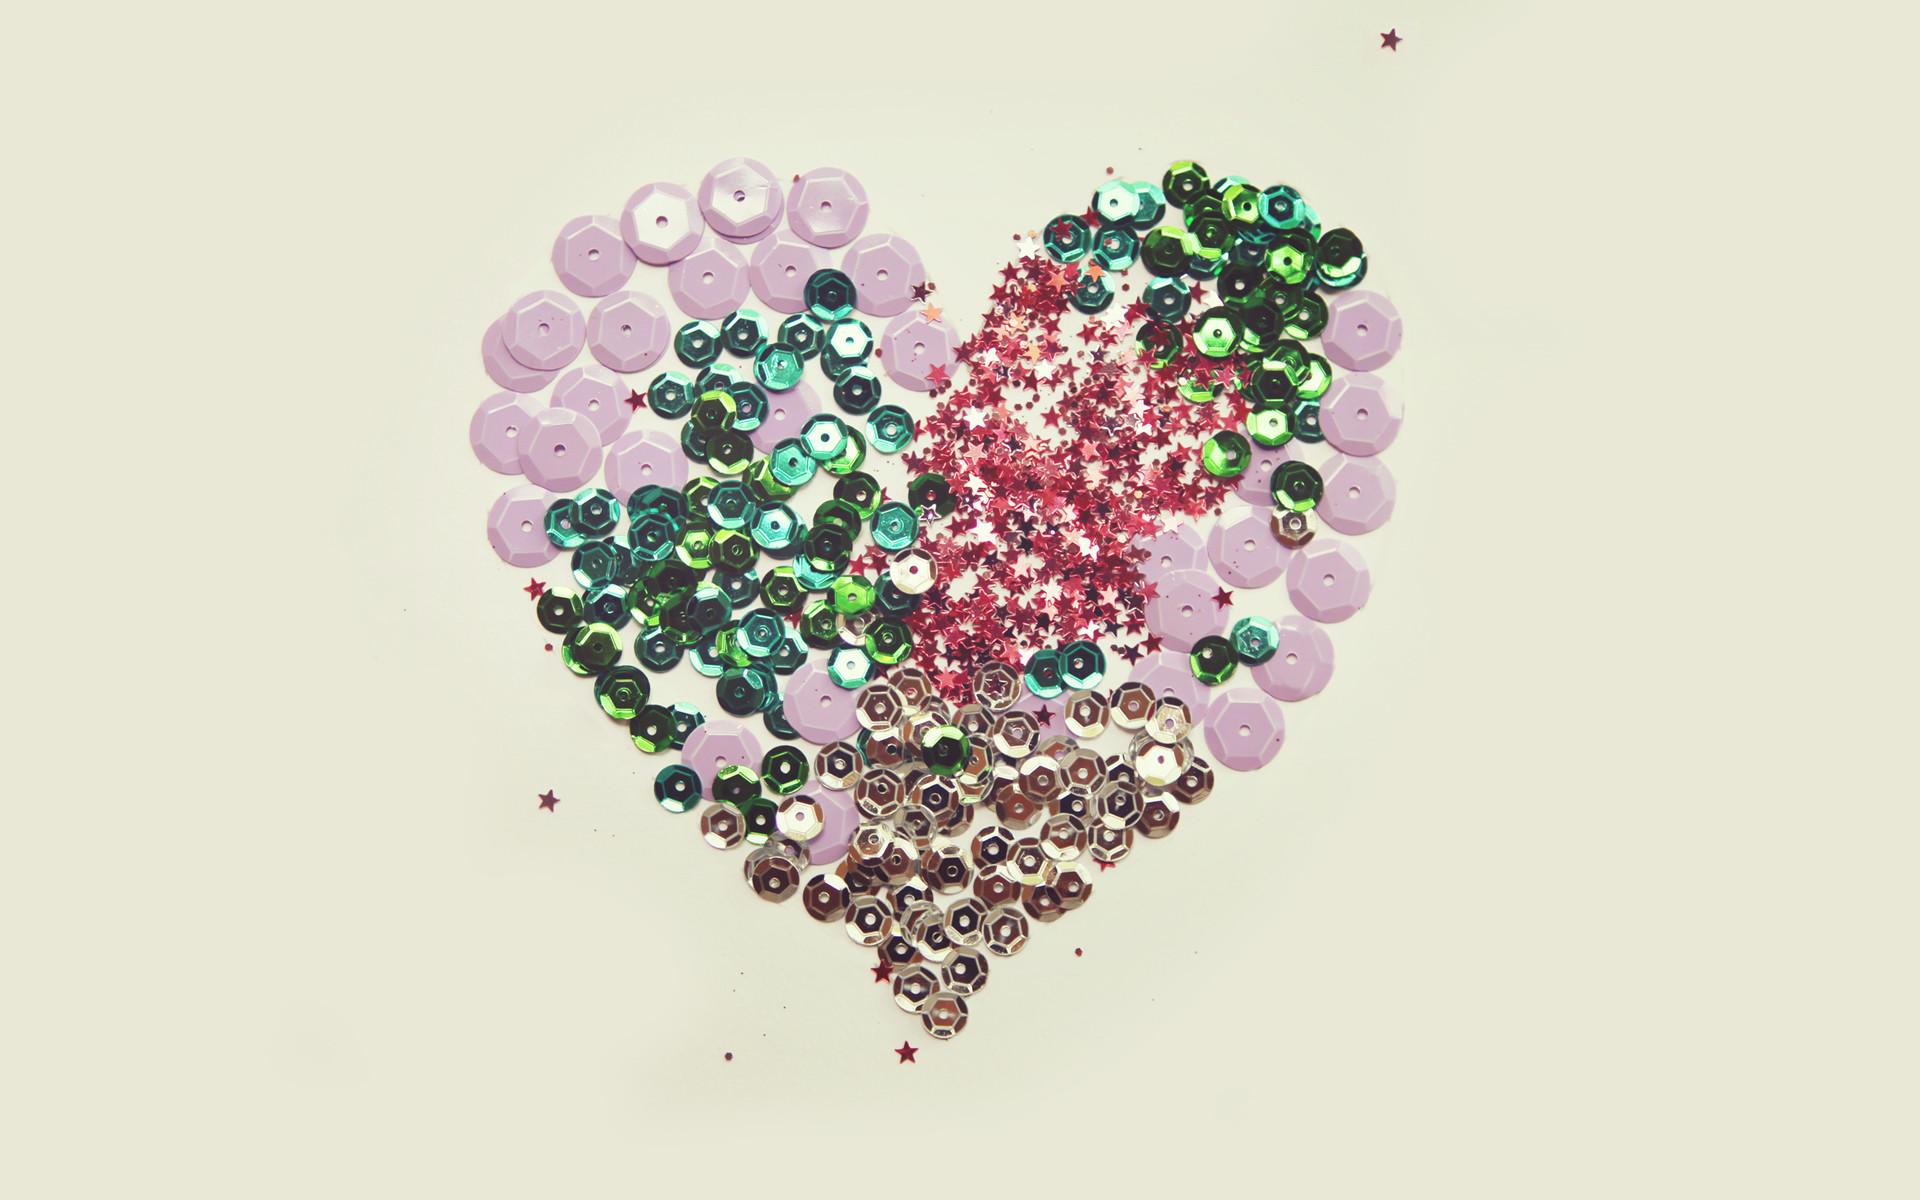 FREE 'Sparkle Heart' Desktop Wallpaper | April 03, 2013